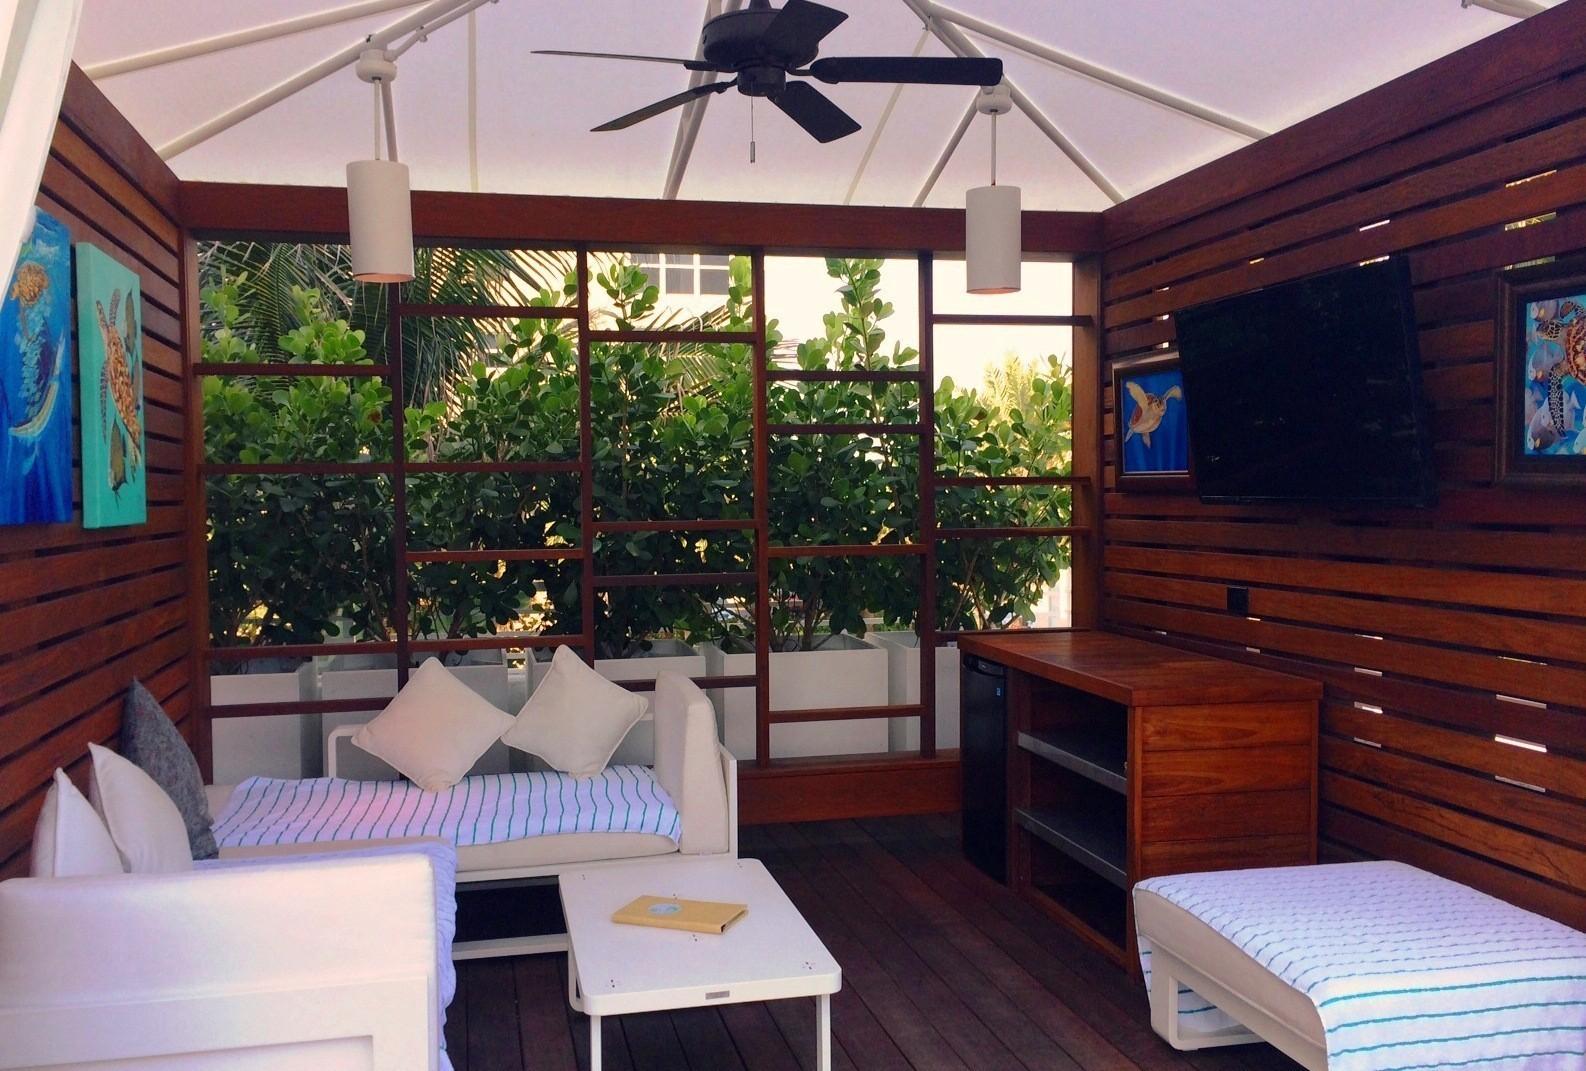 Beach Hotel For Sale Florida